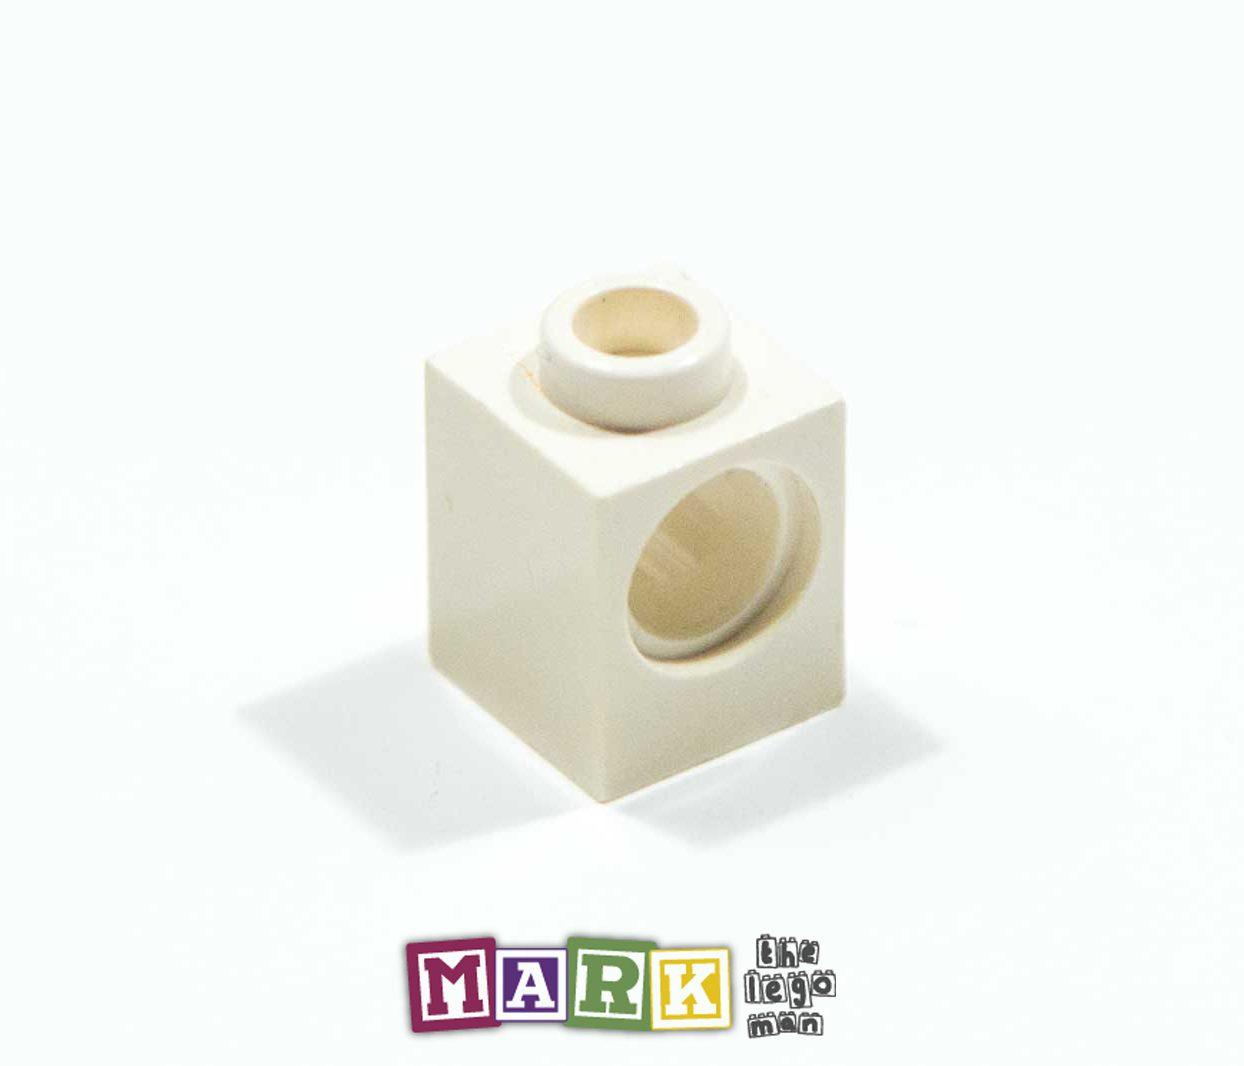 Lego 6541 1x1 Technic Brick with hole 654101